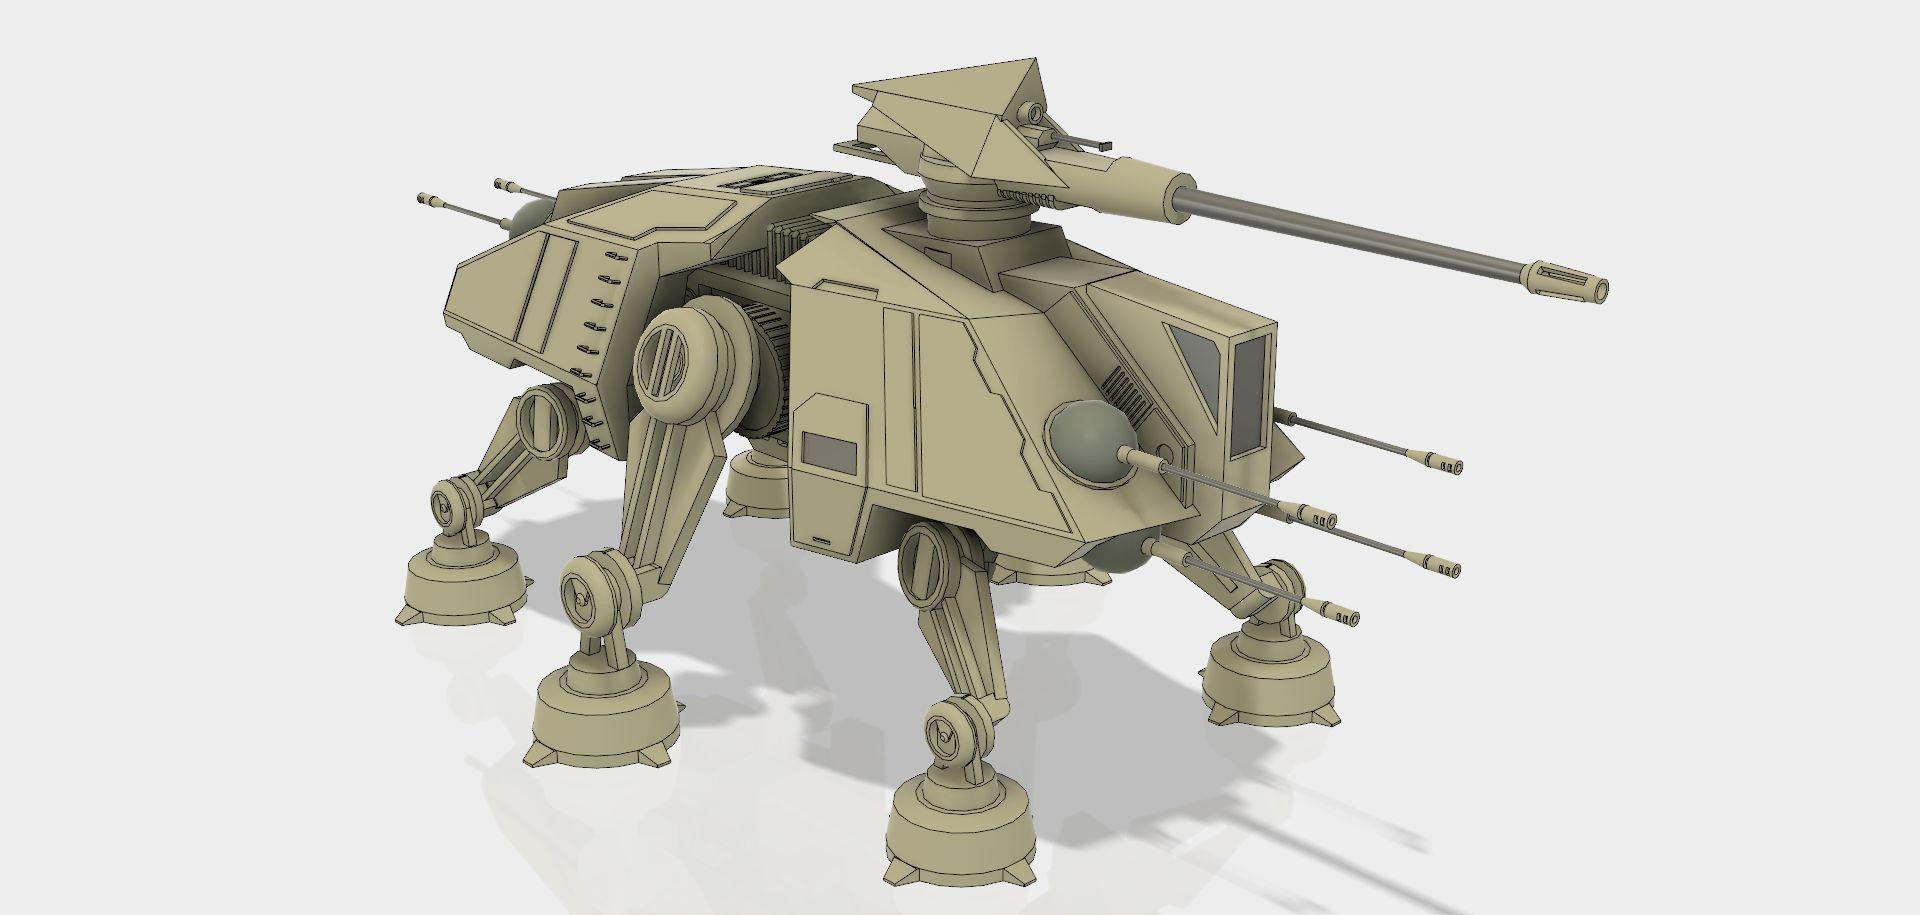 All Terrain Tactical Enforcer (AT-TE)|Autodesk Online Gallery